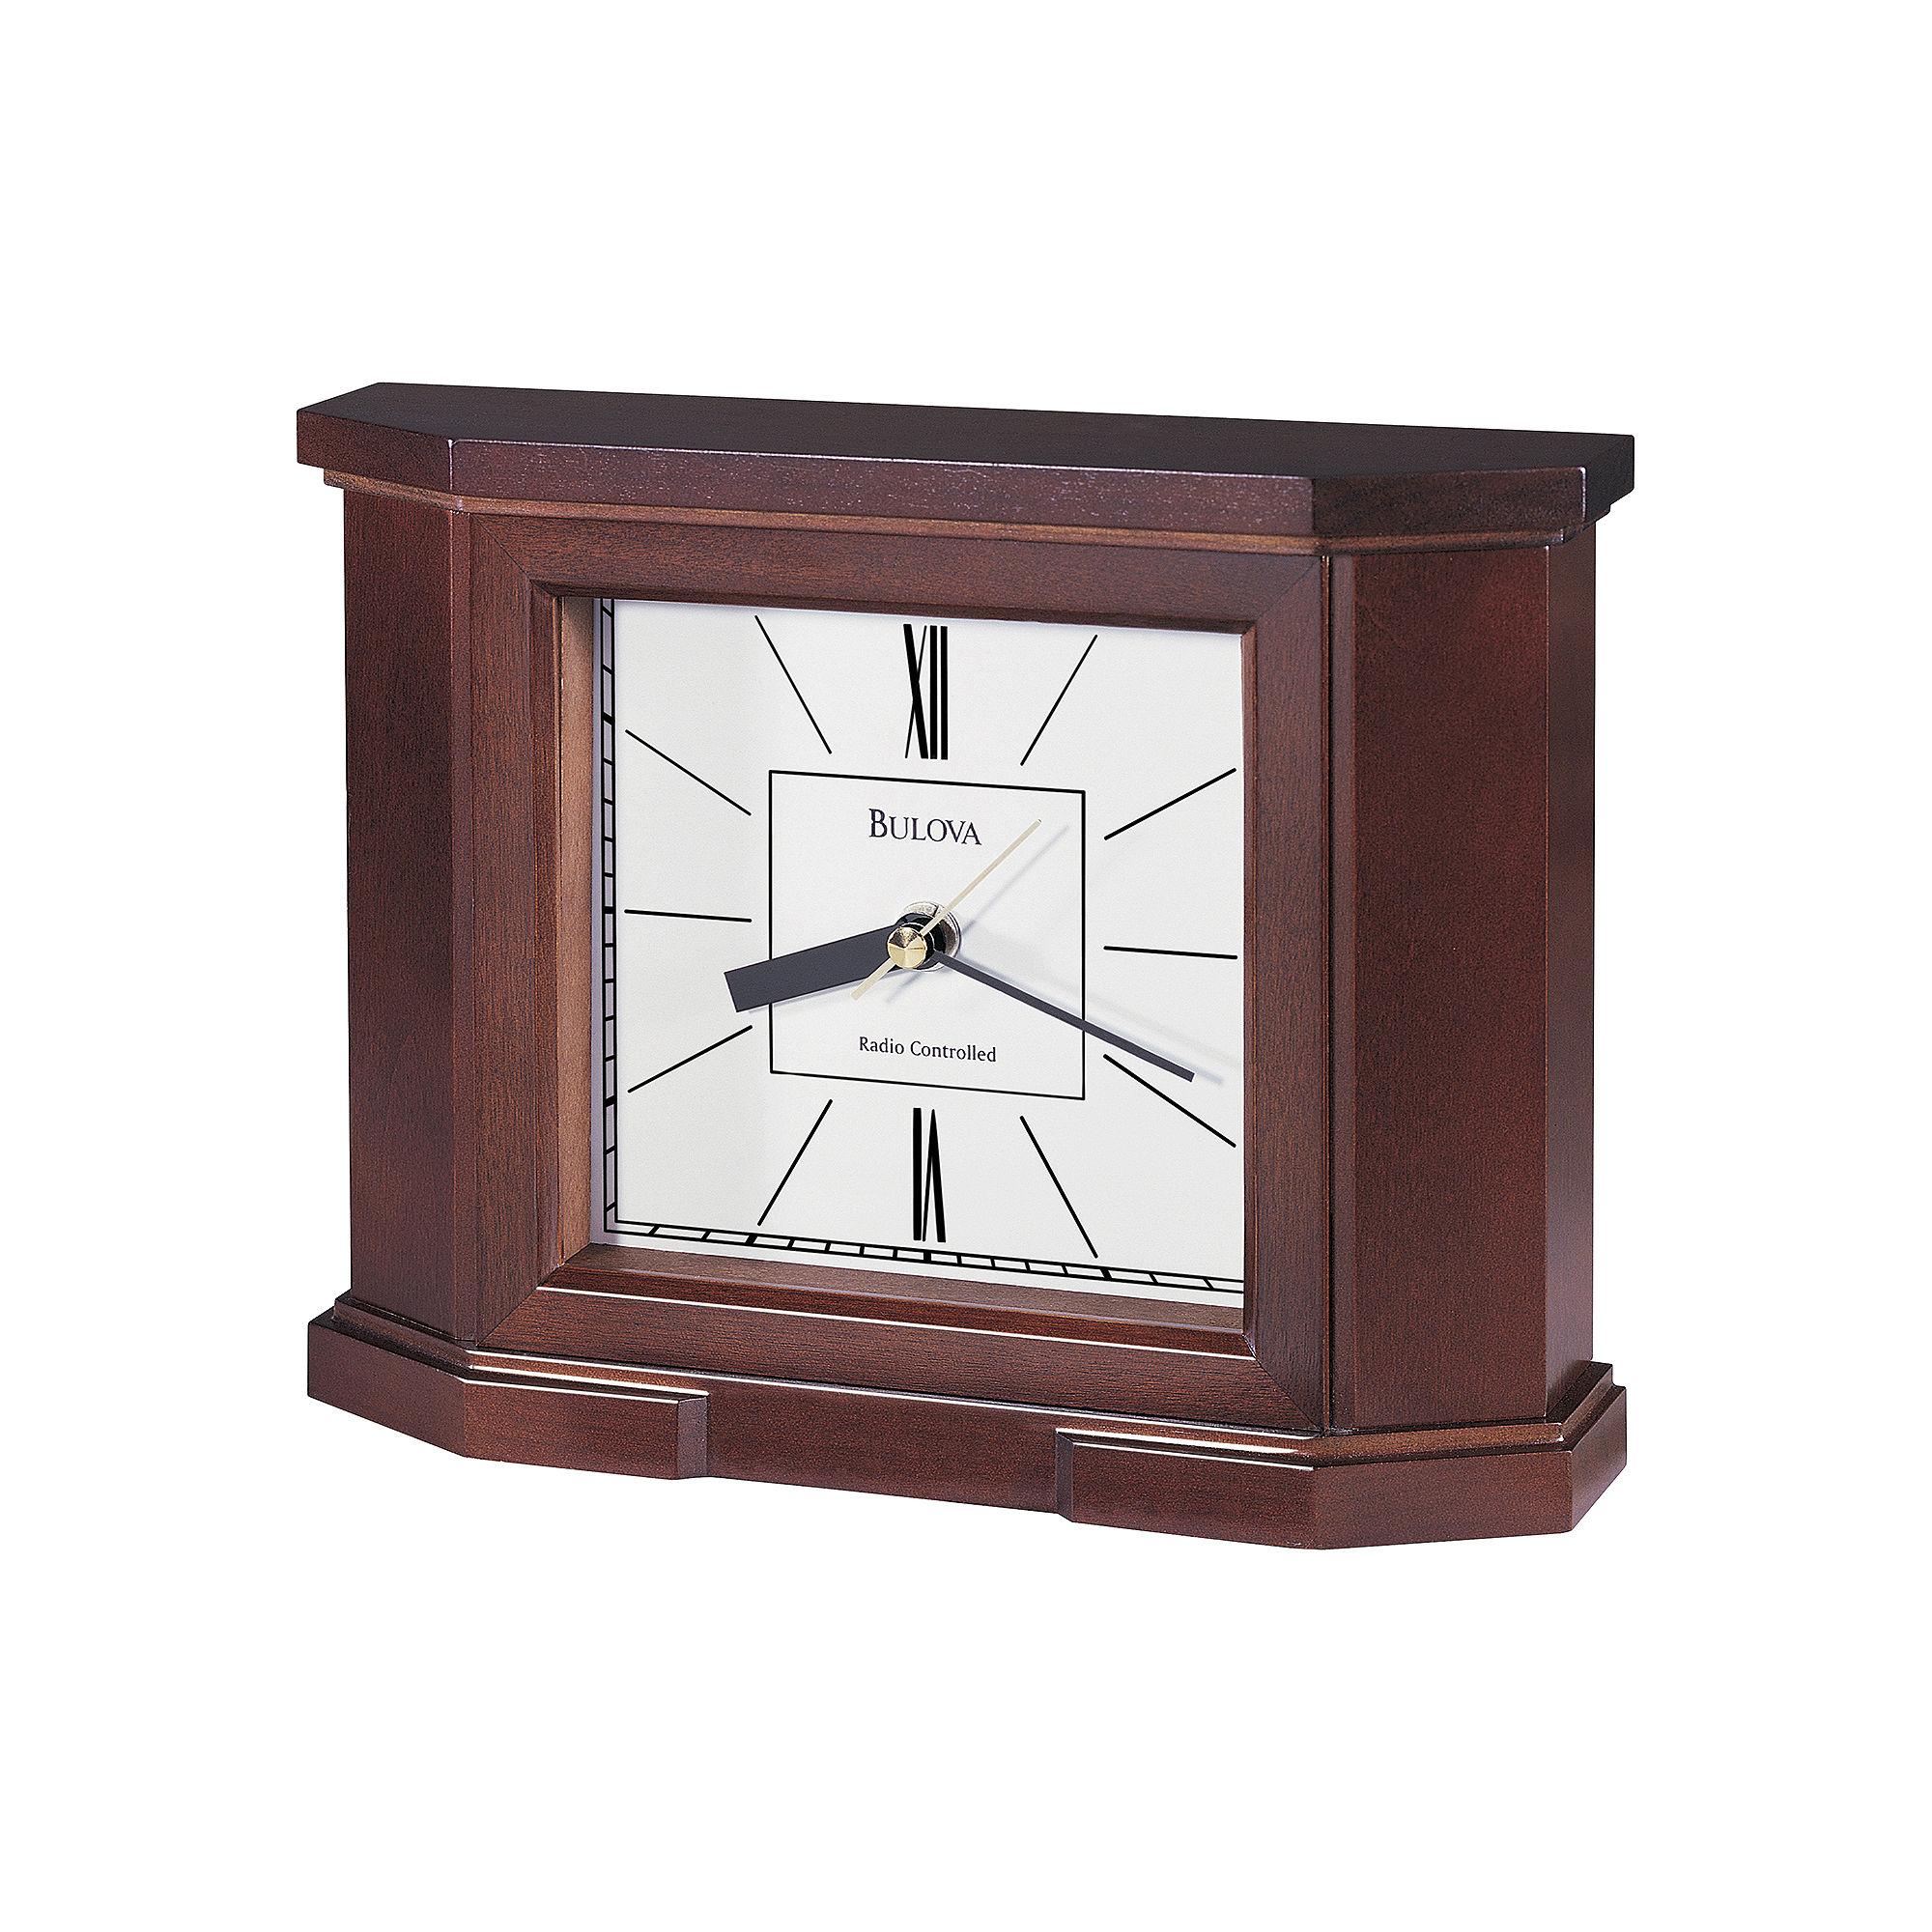 Bulova Altus Atomic Table Clock